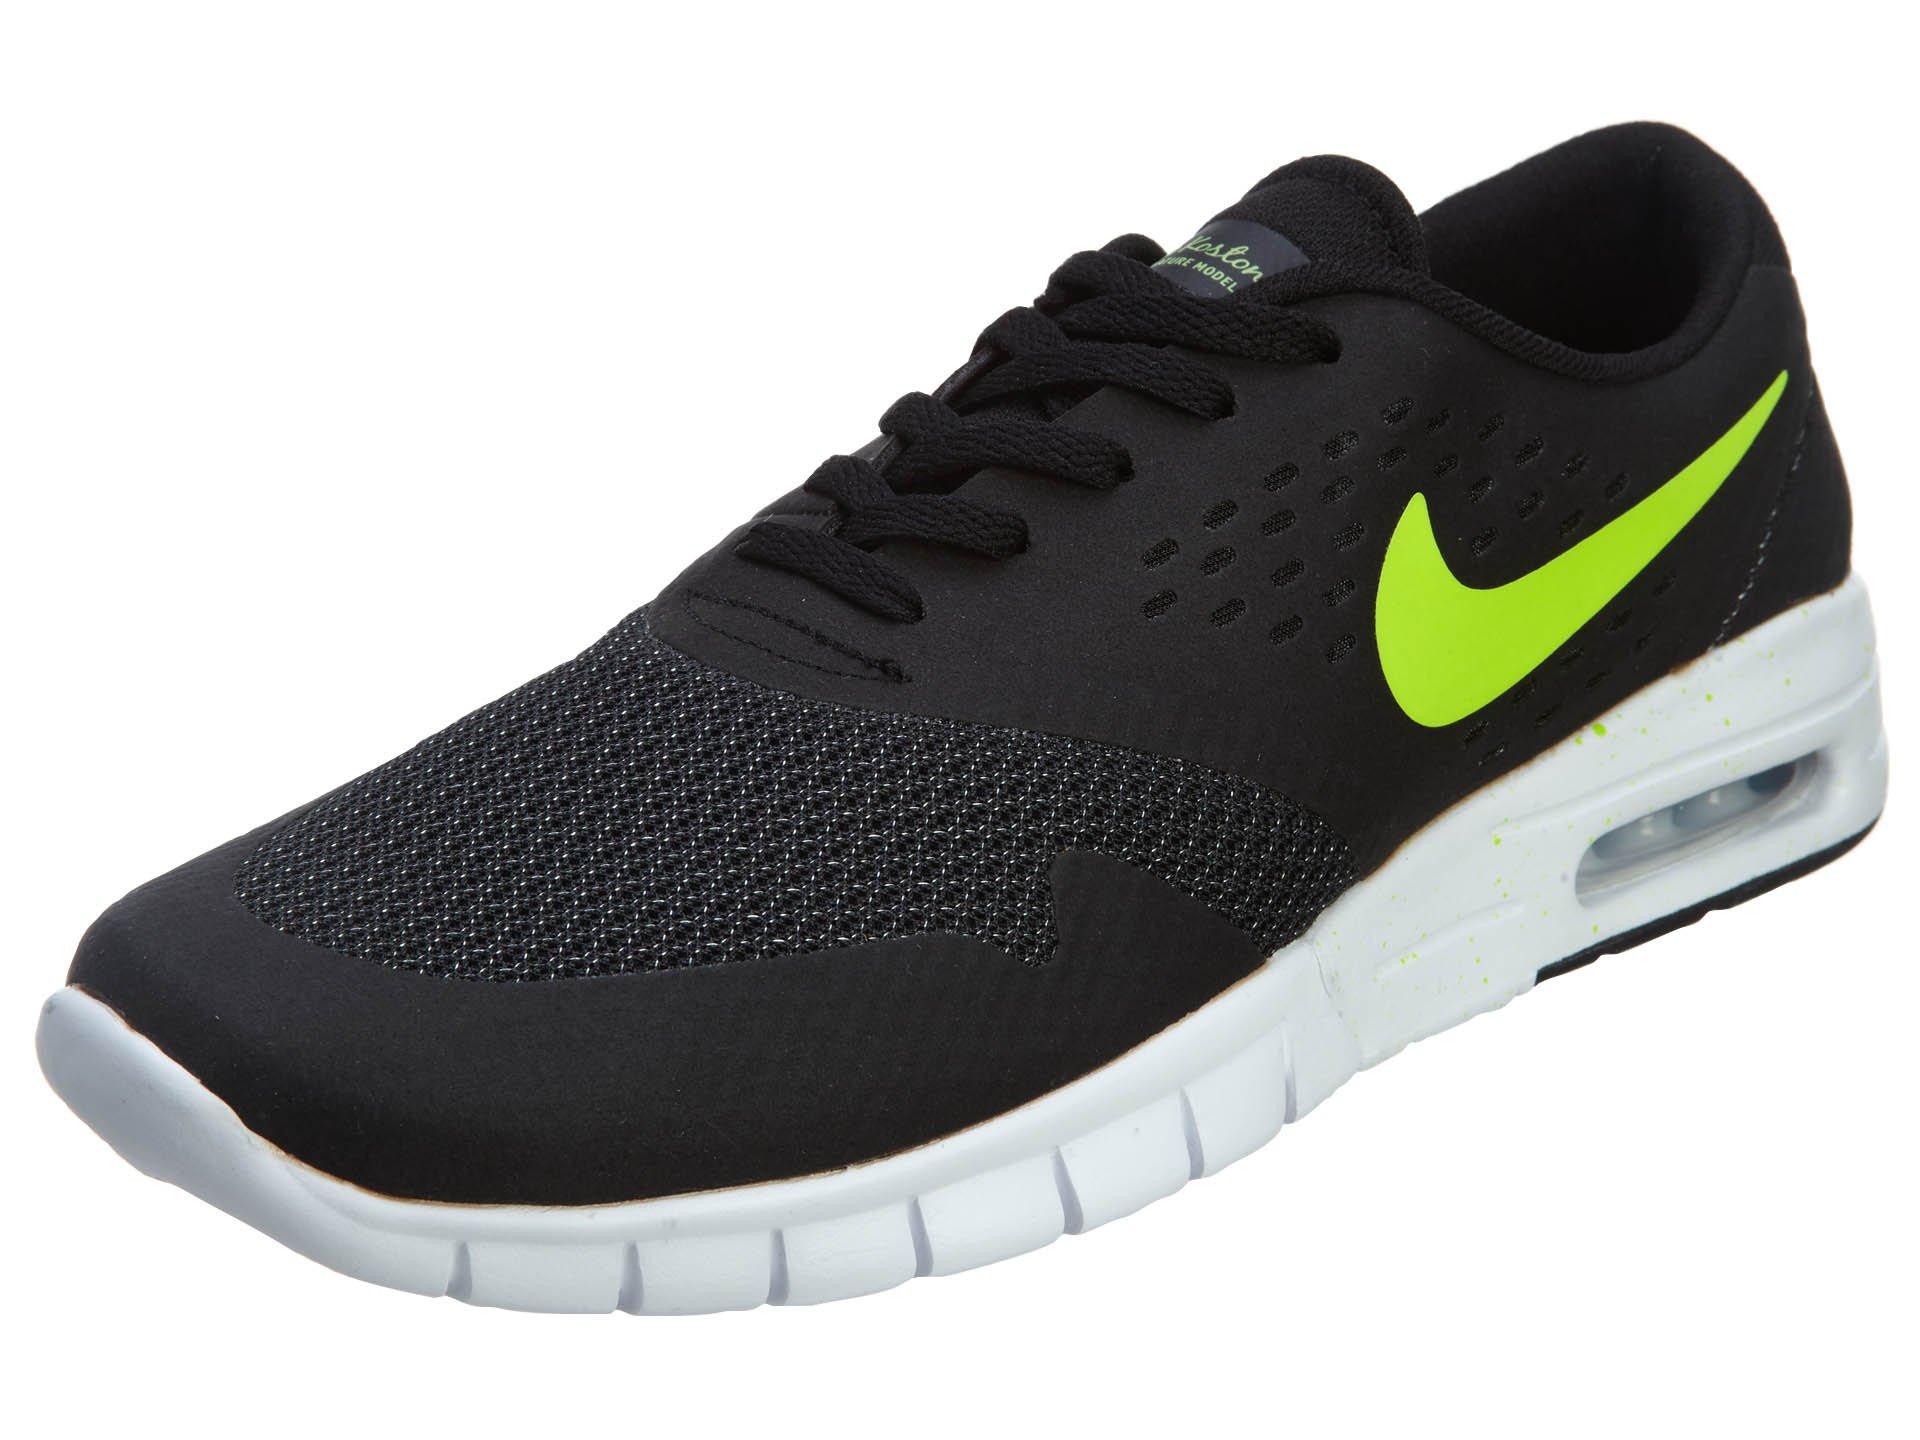 best service cfa26 44b5e Galleon - Nike ERIC KOSTON 2 MAX Mens Skateboarding-shoes 631047-031 Size 8